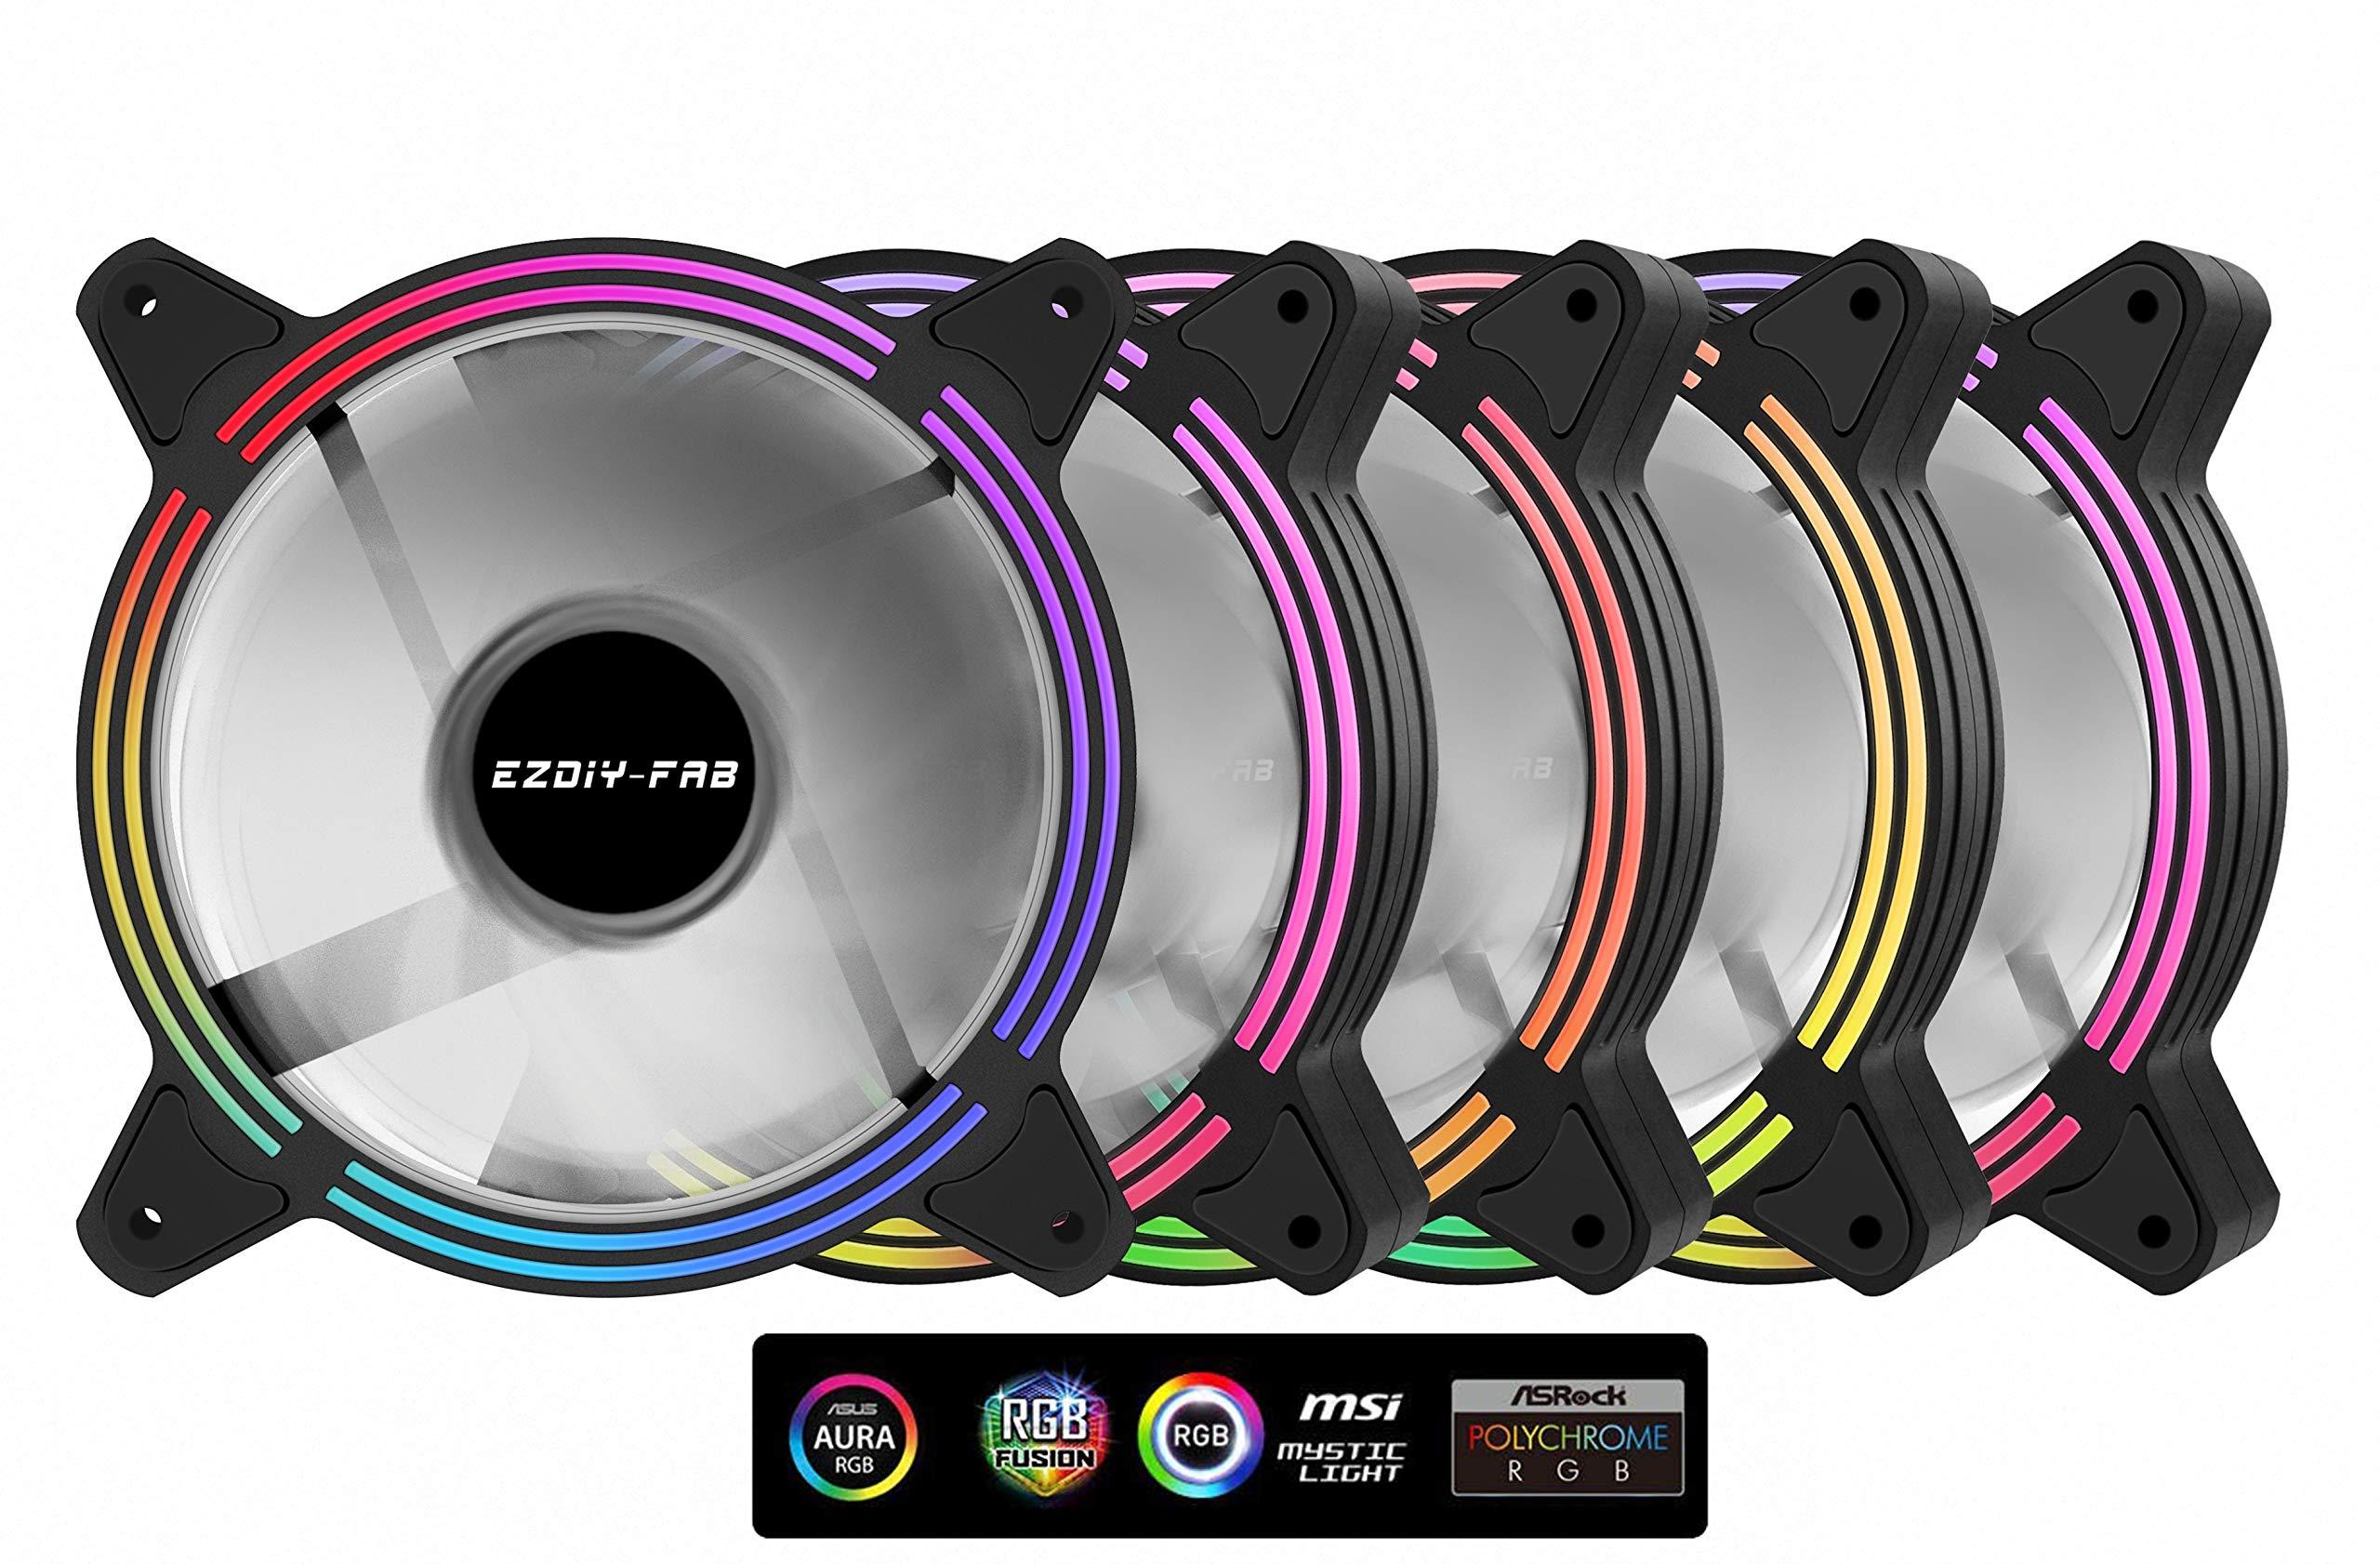 upHere 5V PWM ARGB LED 120mm Case Fan For PC Cooling super